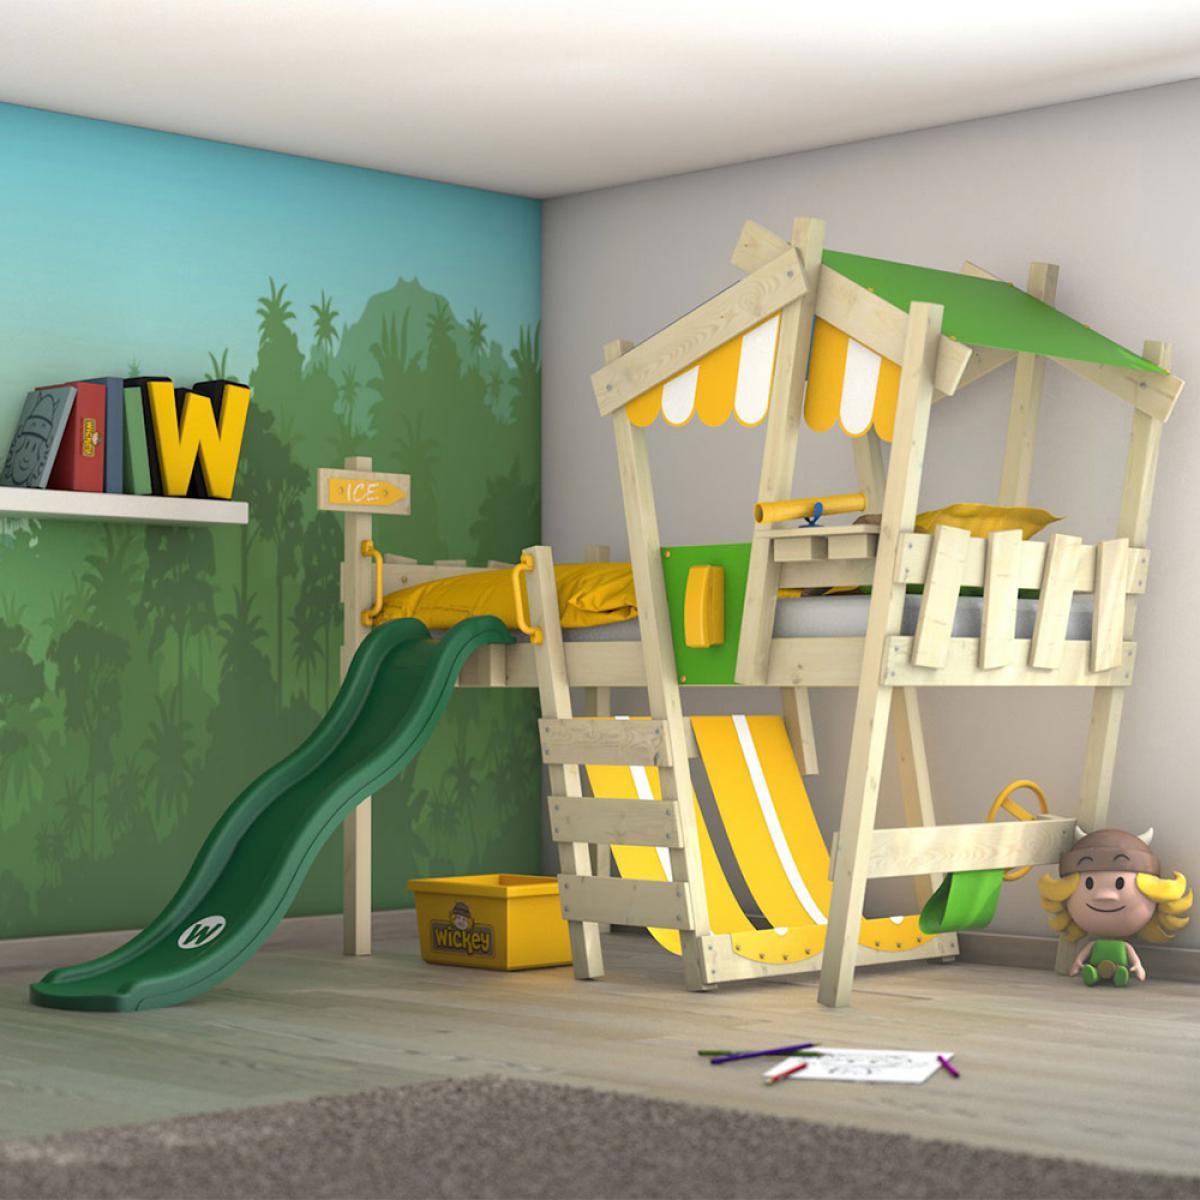 Wickey WICKEY Lit enfant, Lit mezzanine Crazy Hutty avec toboggan vert Lit maison 90 x 200 cm